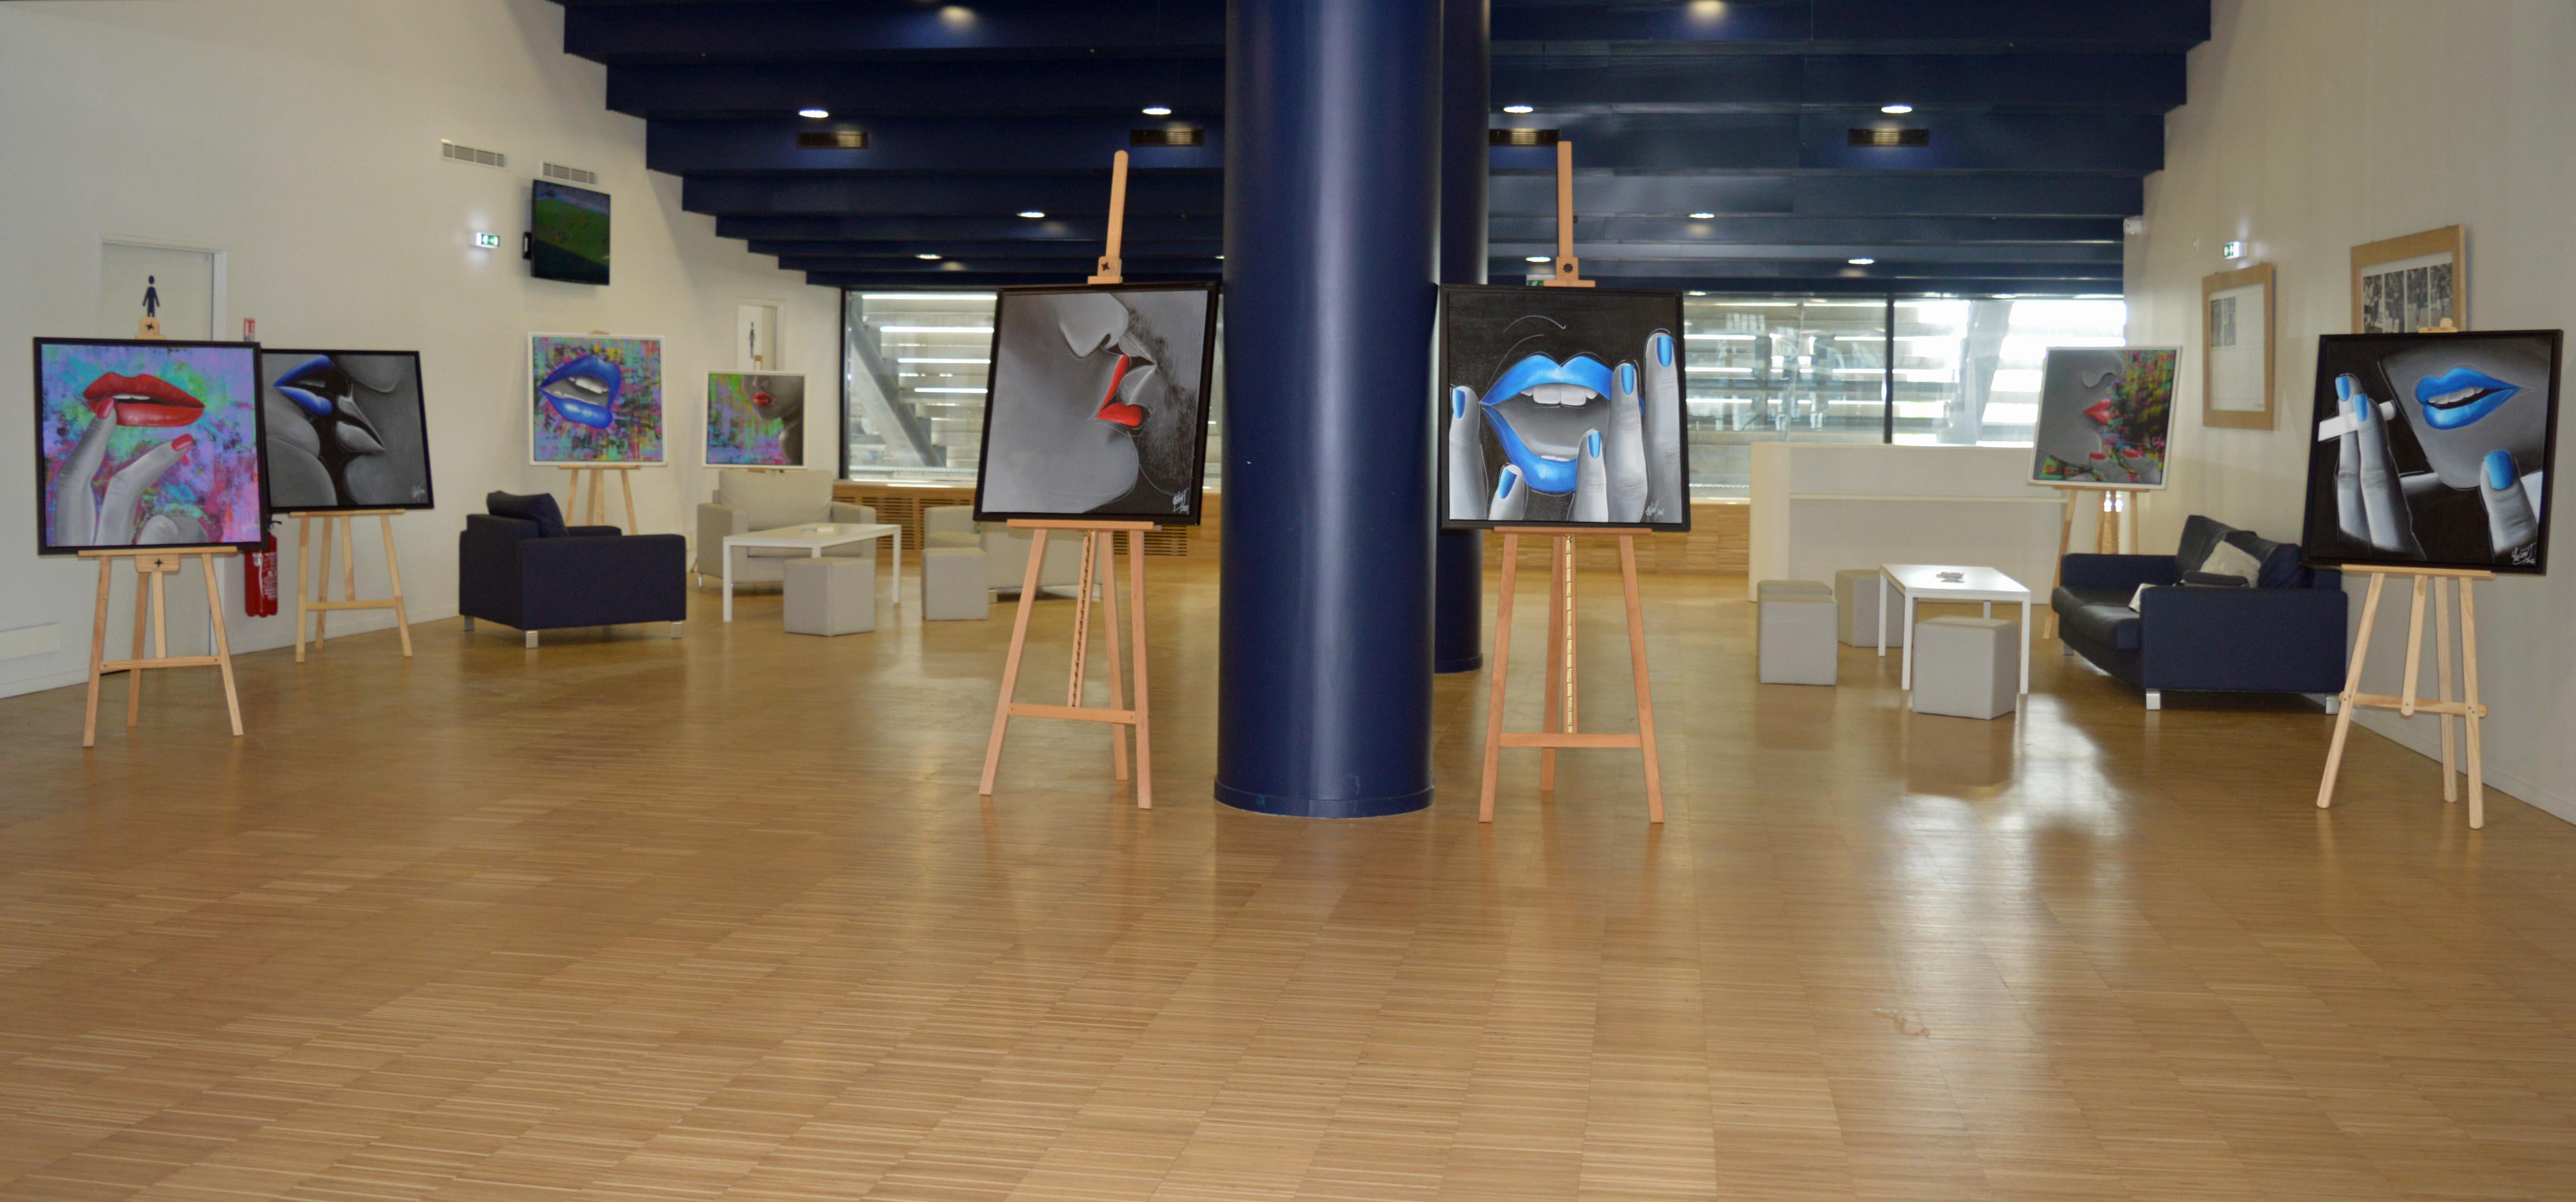 Expo au stade matmut atlantique girondins psg 11mai for Matmut salon